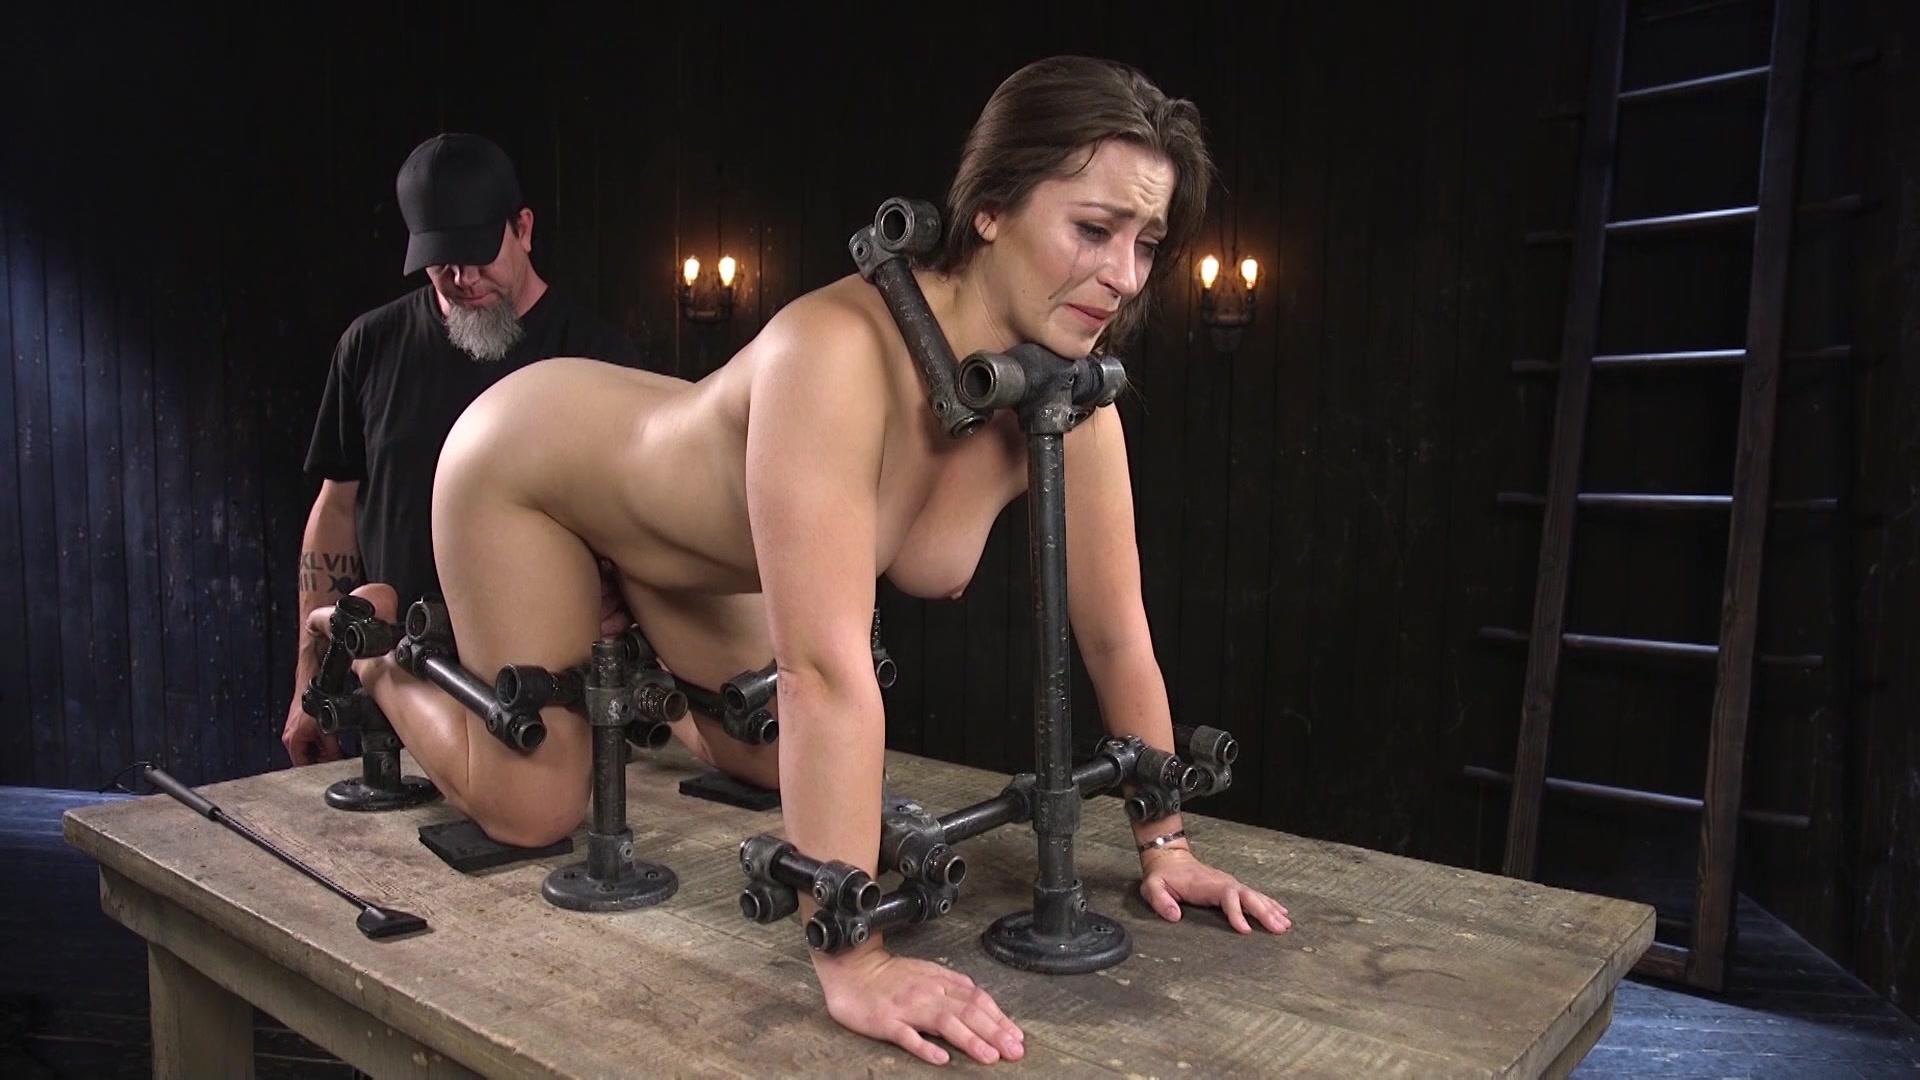 Device Bondage Dani Daniels Unlimited Legs Ig Sex Hq Pics